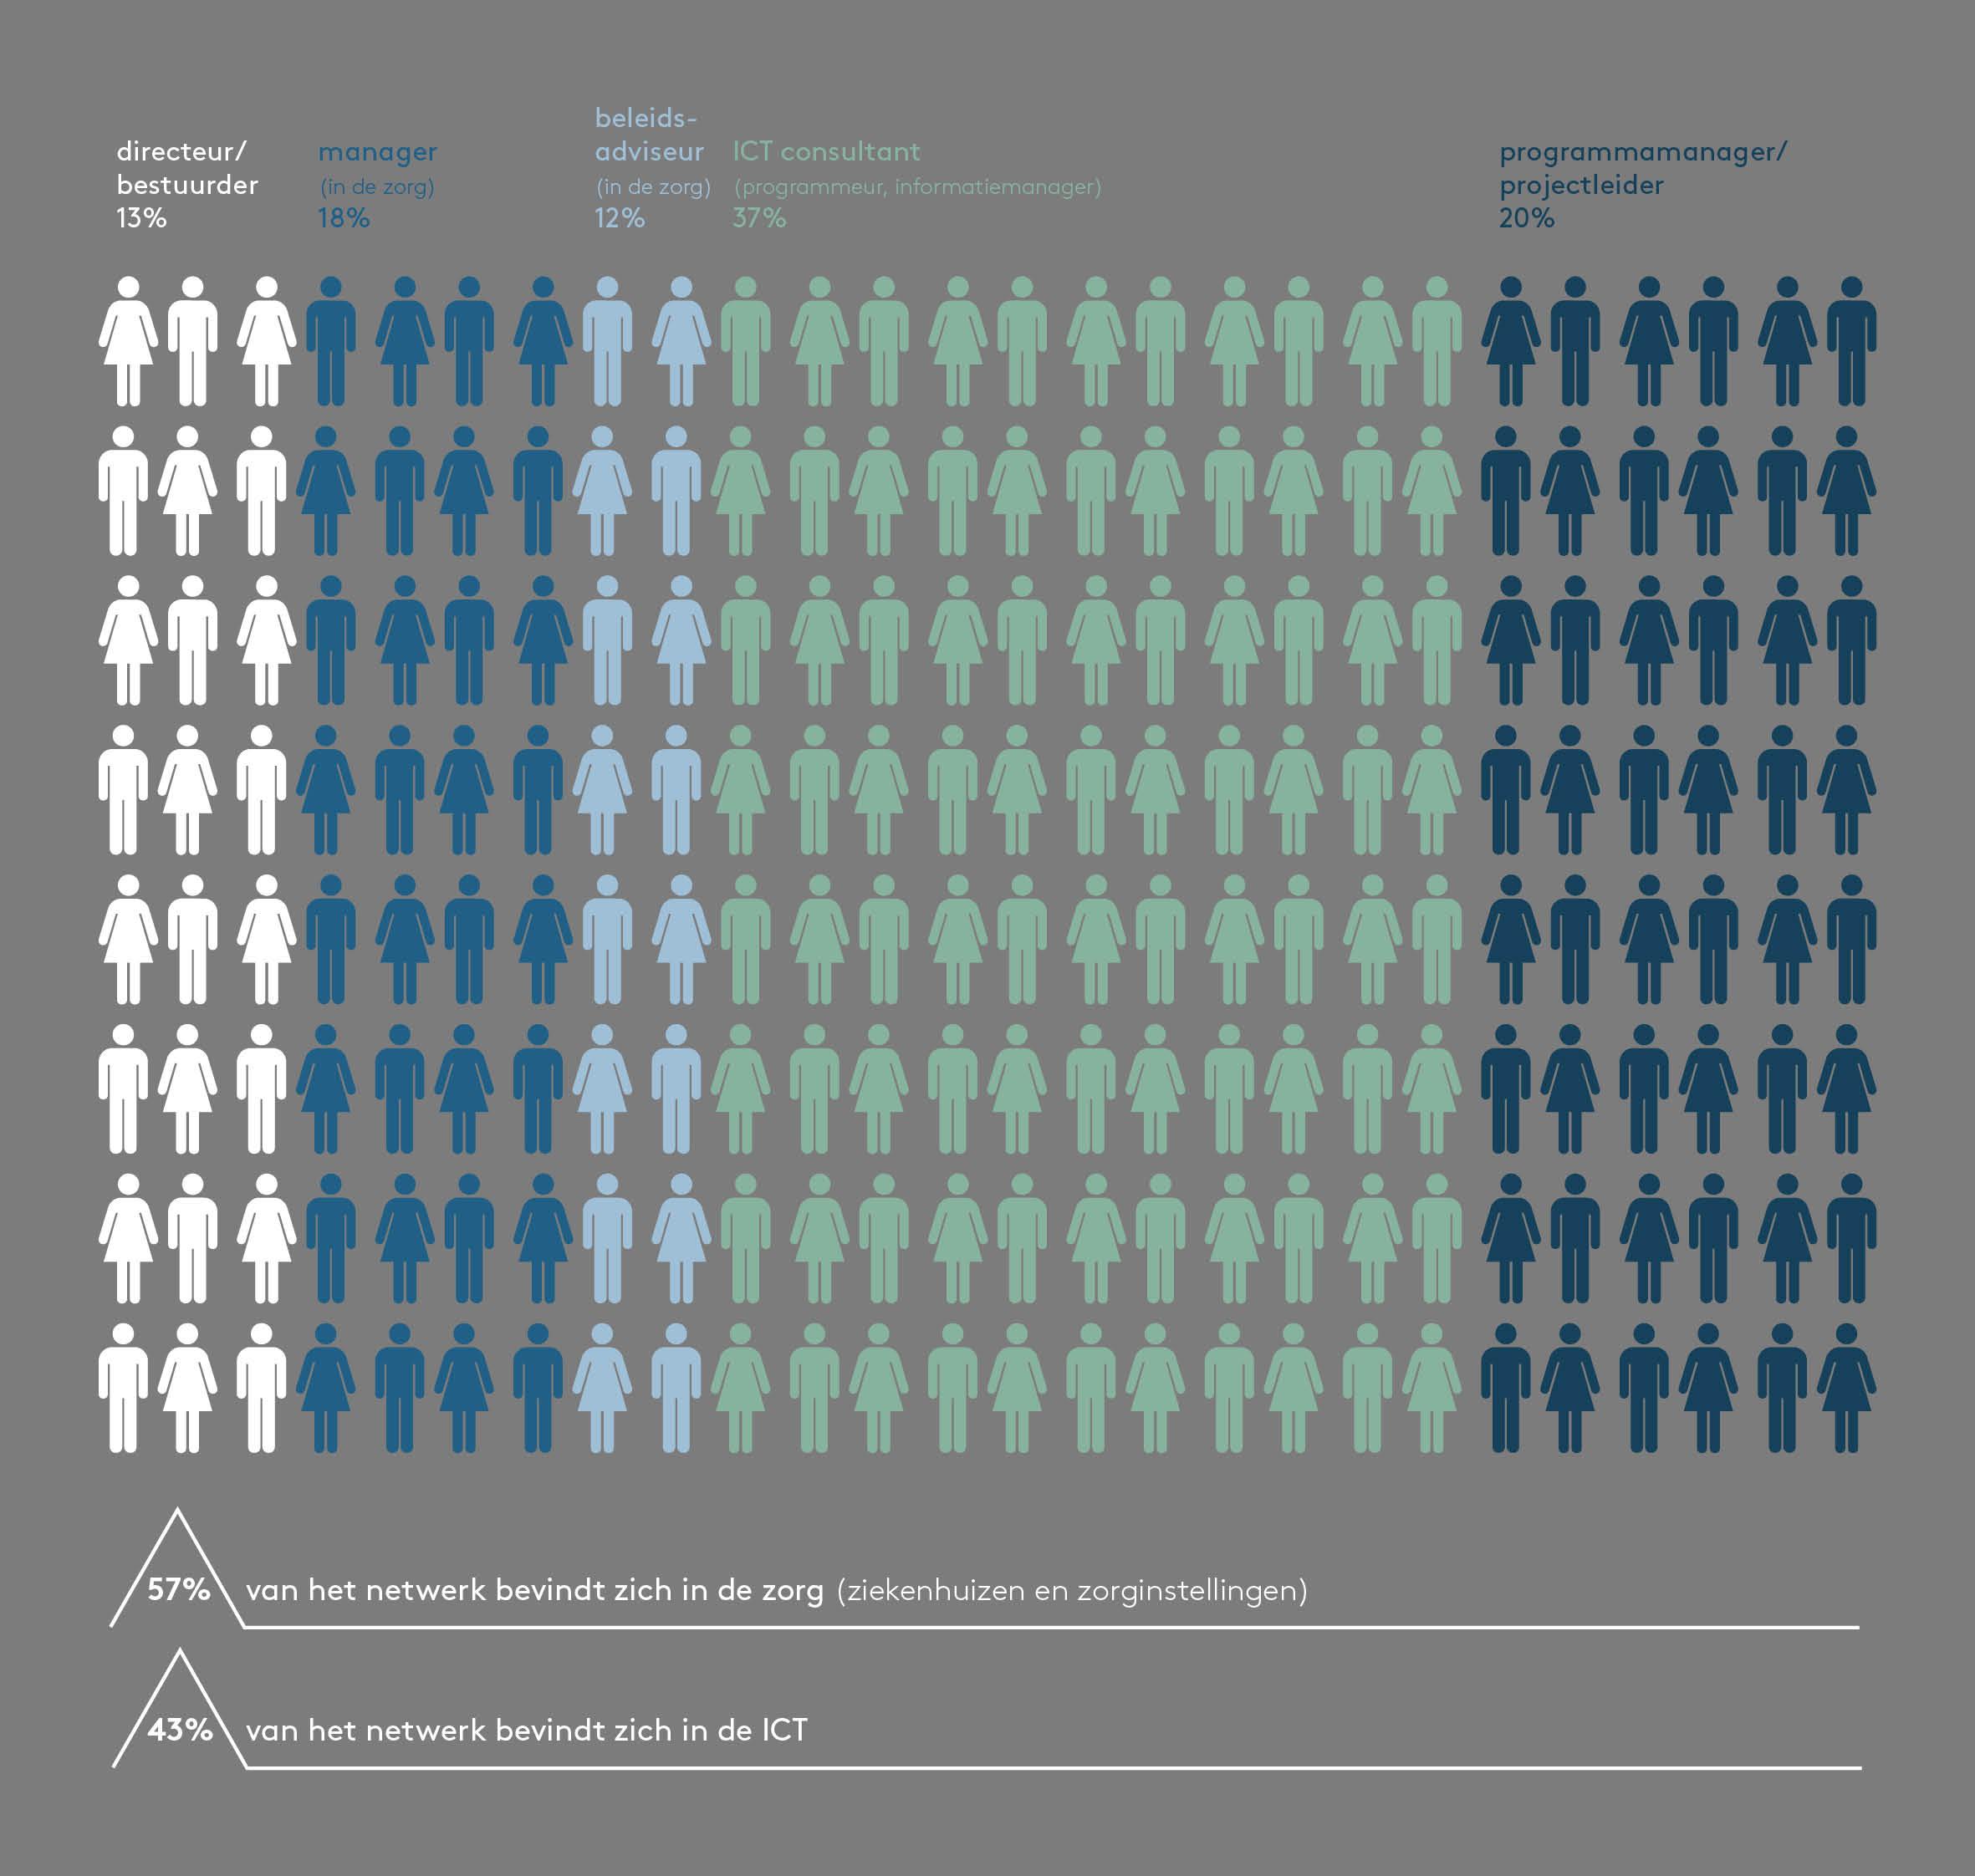 MdL_Infographic_netwerk